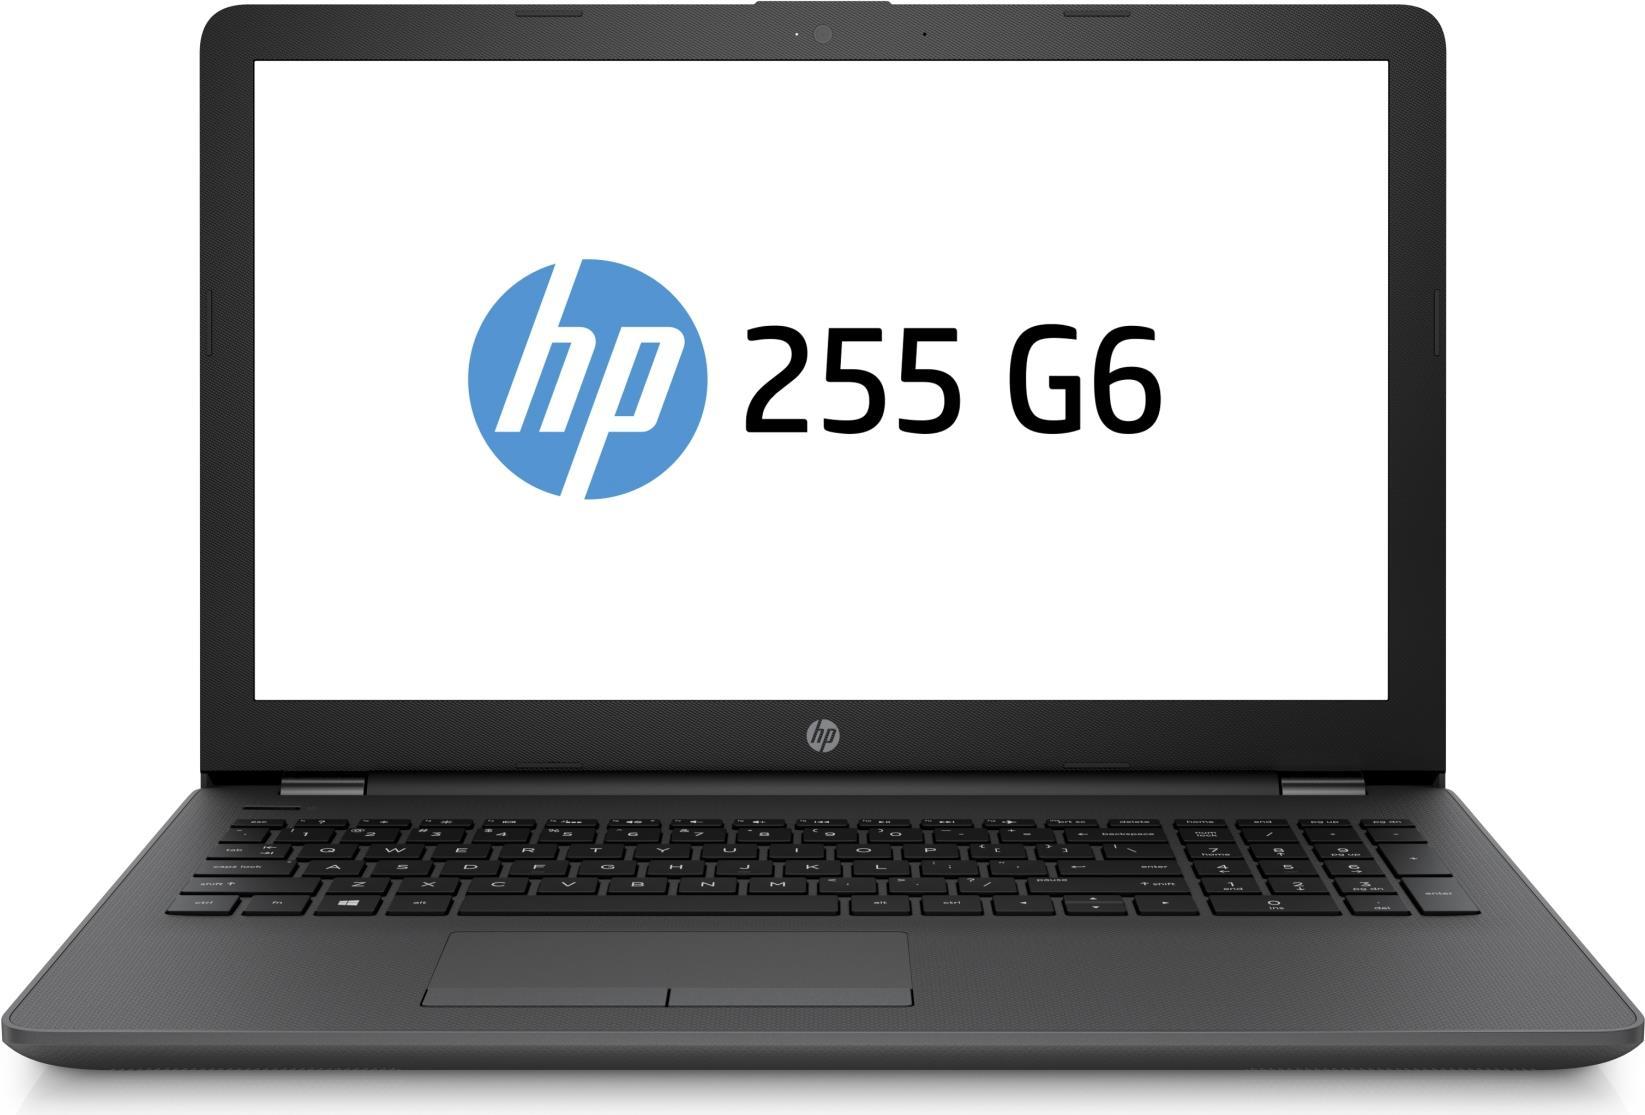 Notebooks, Laptops - Notebook HP 255 G6 2VP35ES HD E2 FreeDOS () (2VP35ES)  - Onlineshop JACOB Elektronik